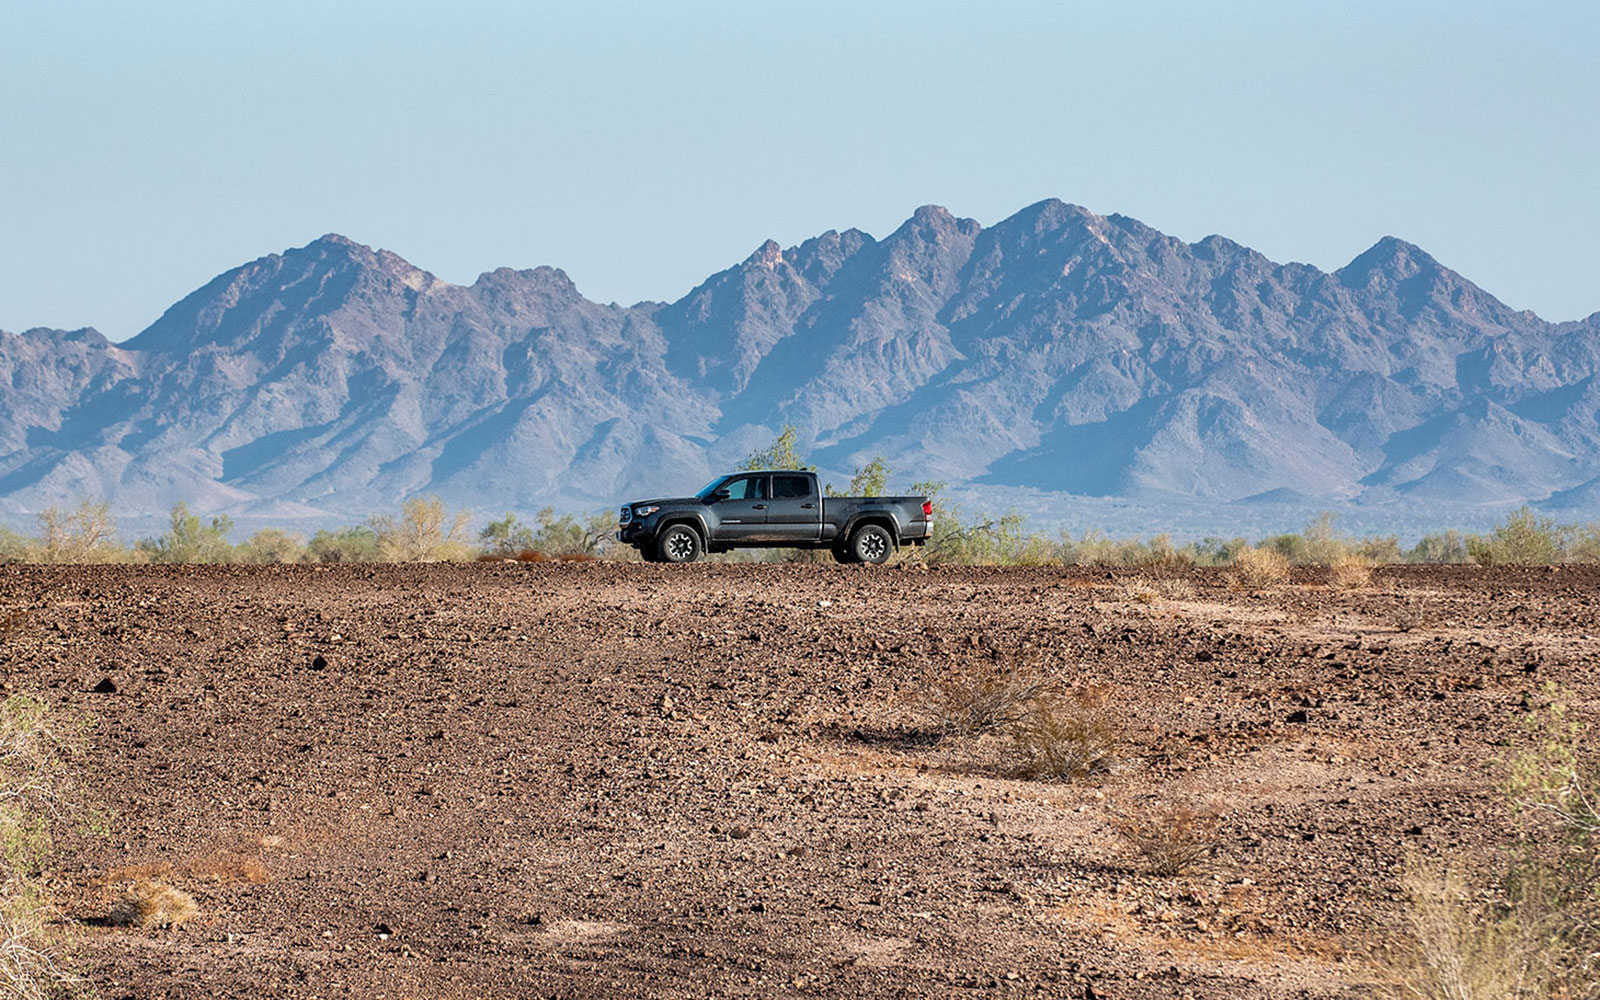 The trusty desert dirt devil expands the boundaries of exploration.